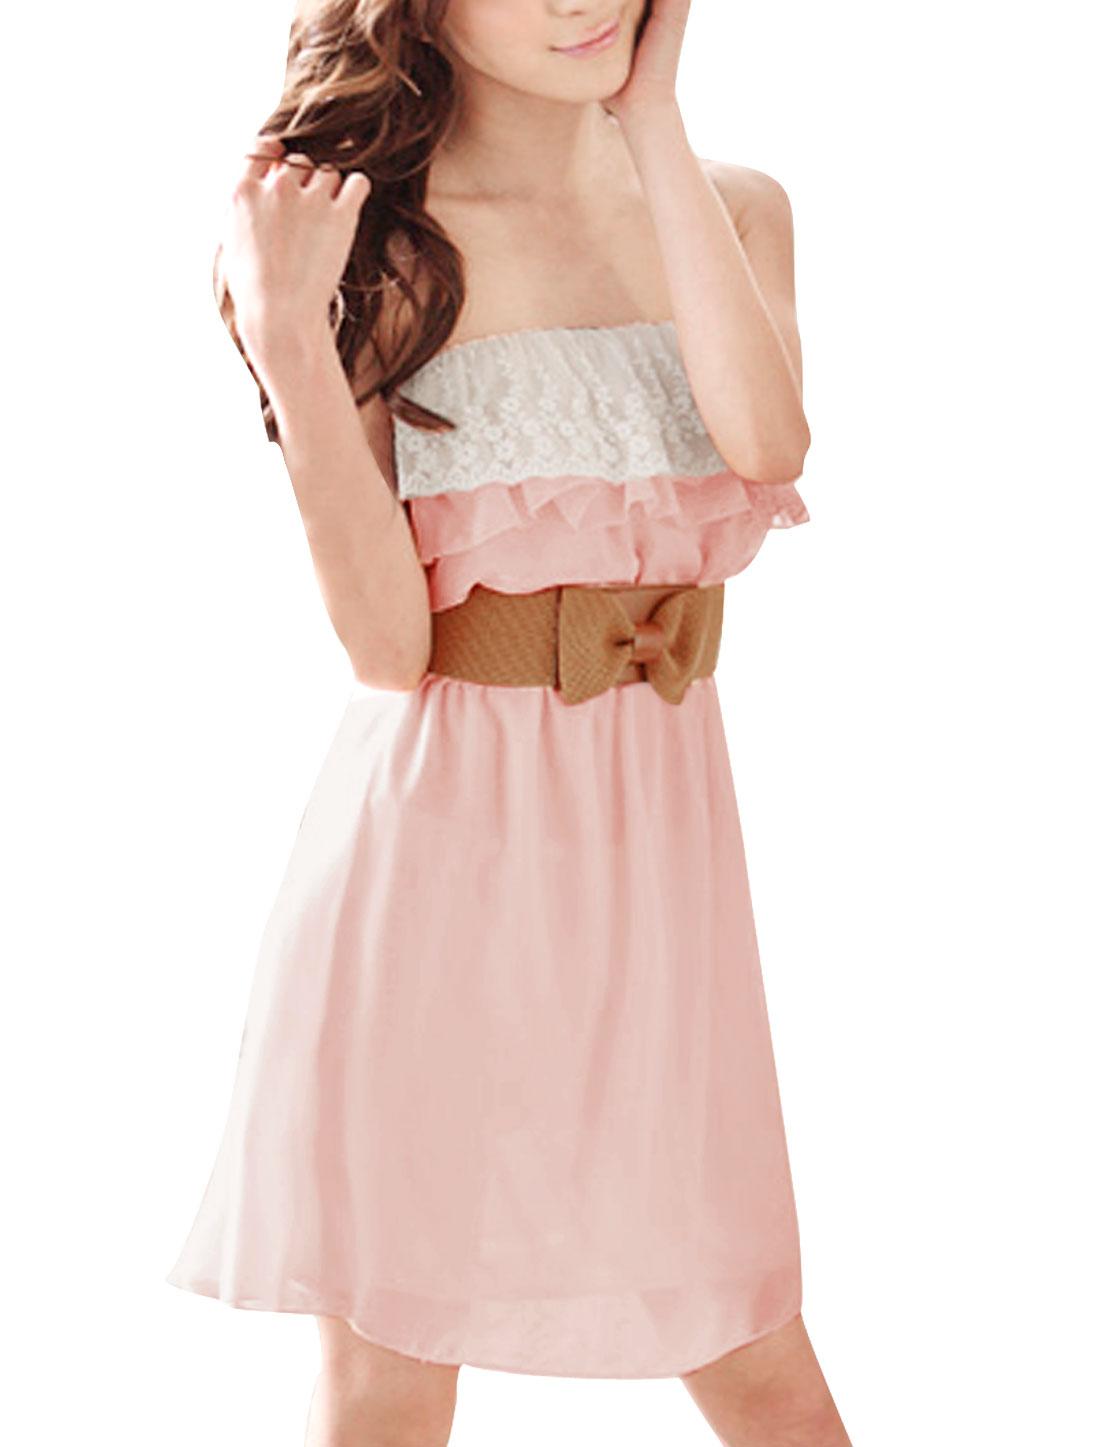 Lady Stylish Pink Tiered Ruffles Decor Tube Mini Dress w Elastic Belt S